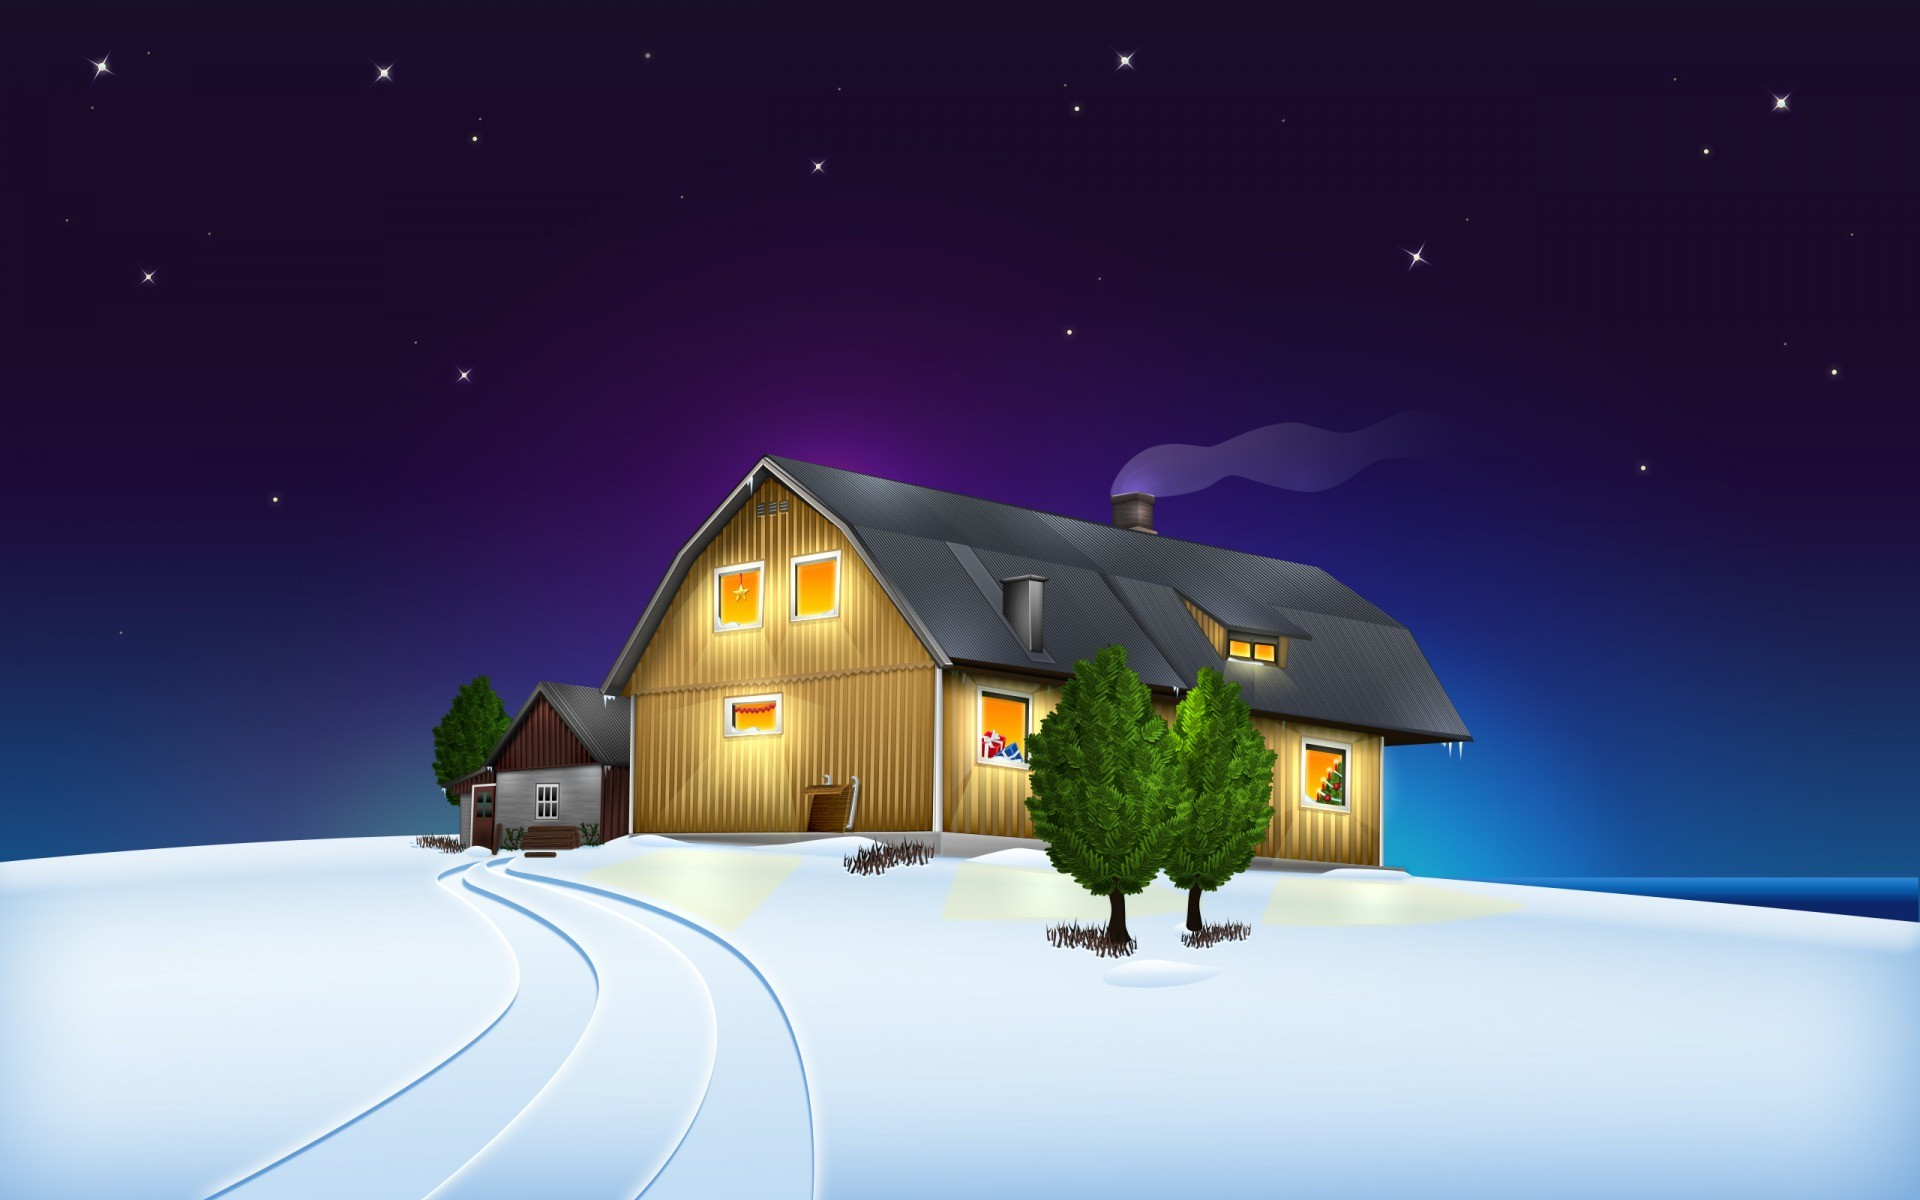 Christmas House Desktop Wallpapers | WallpaperCow.com